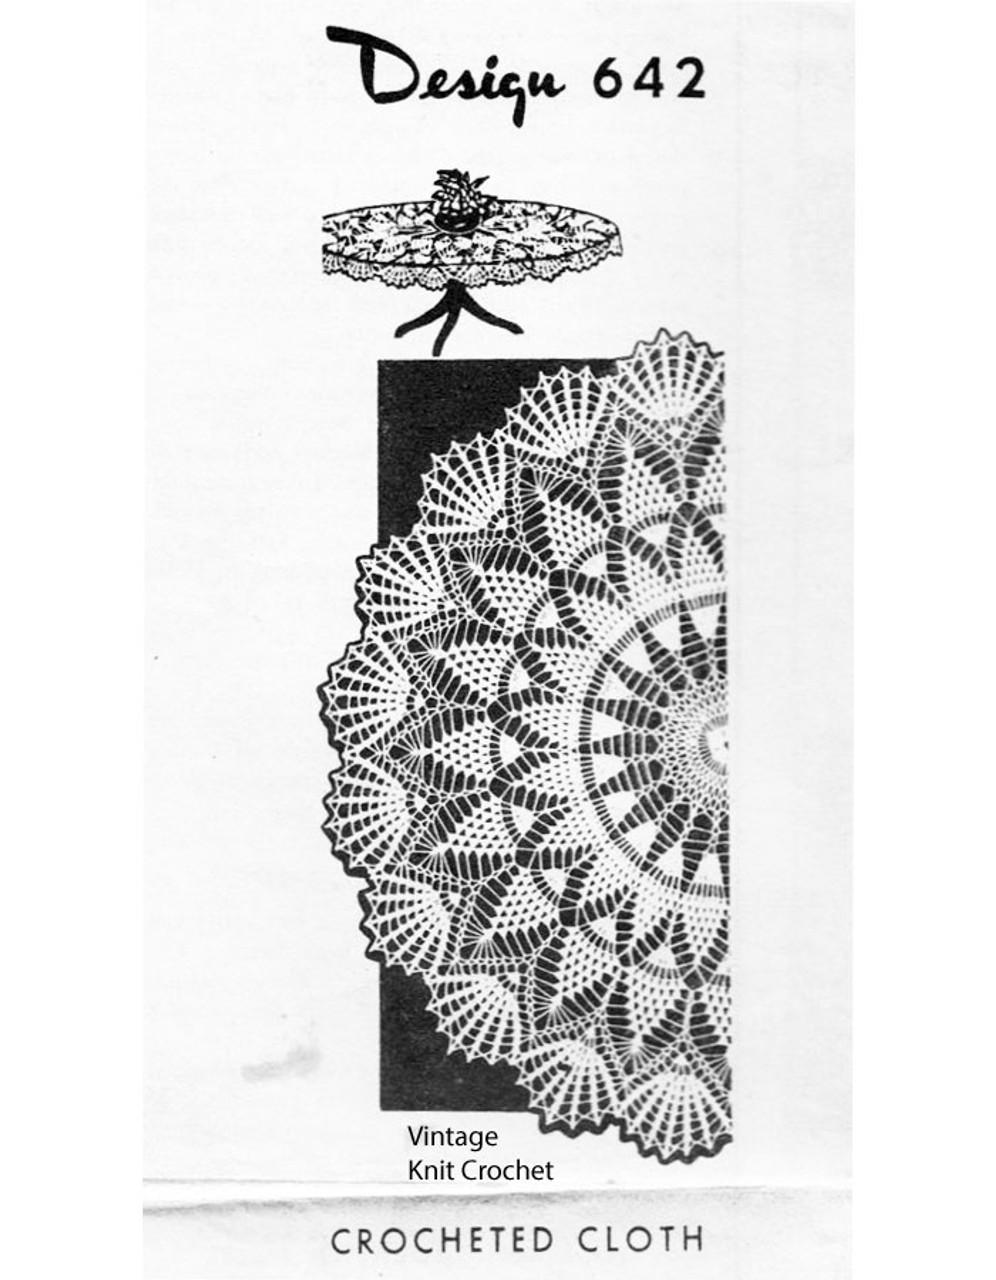 Pineapple Centerpiece Doily pattern, Design 642